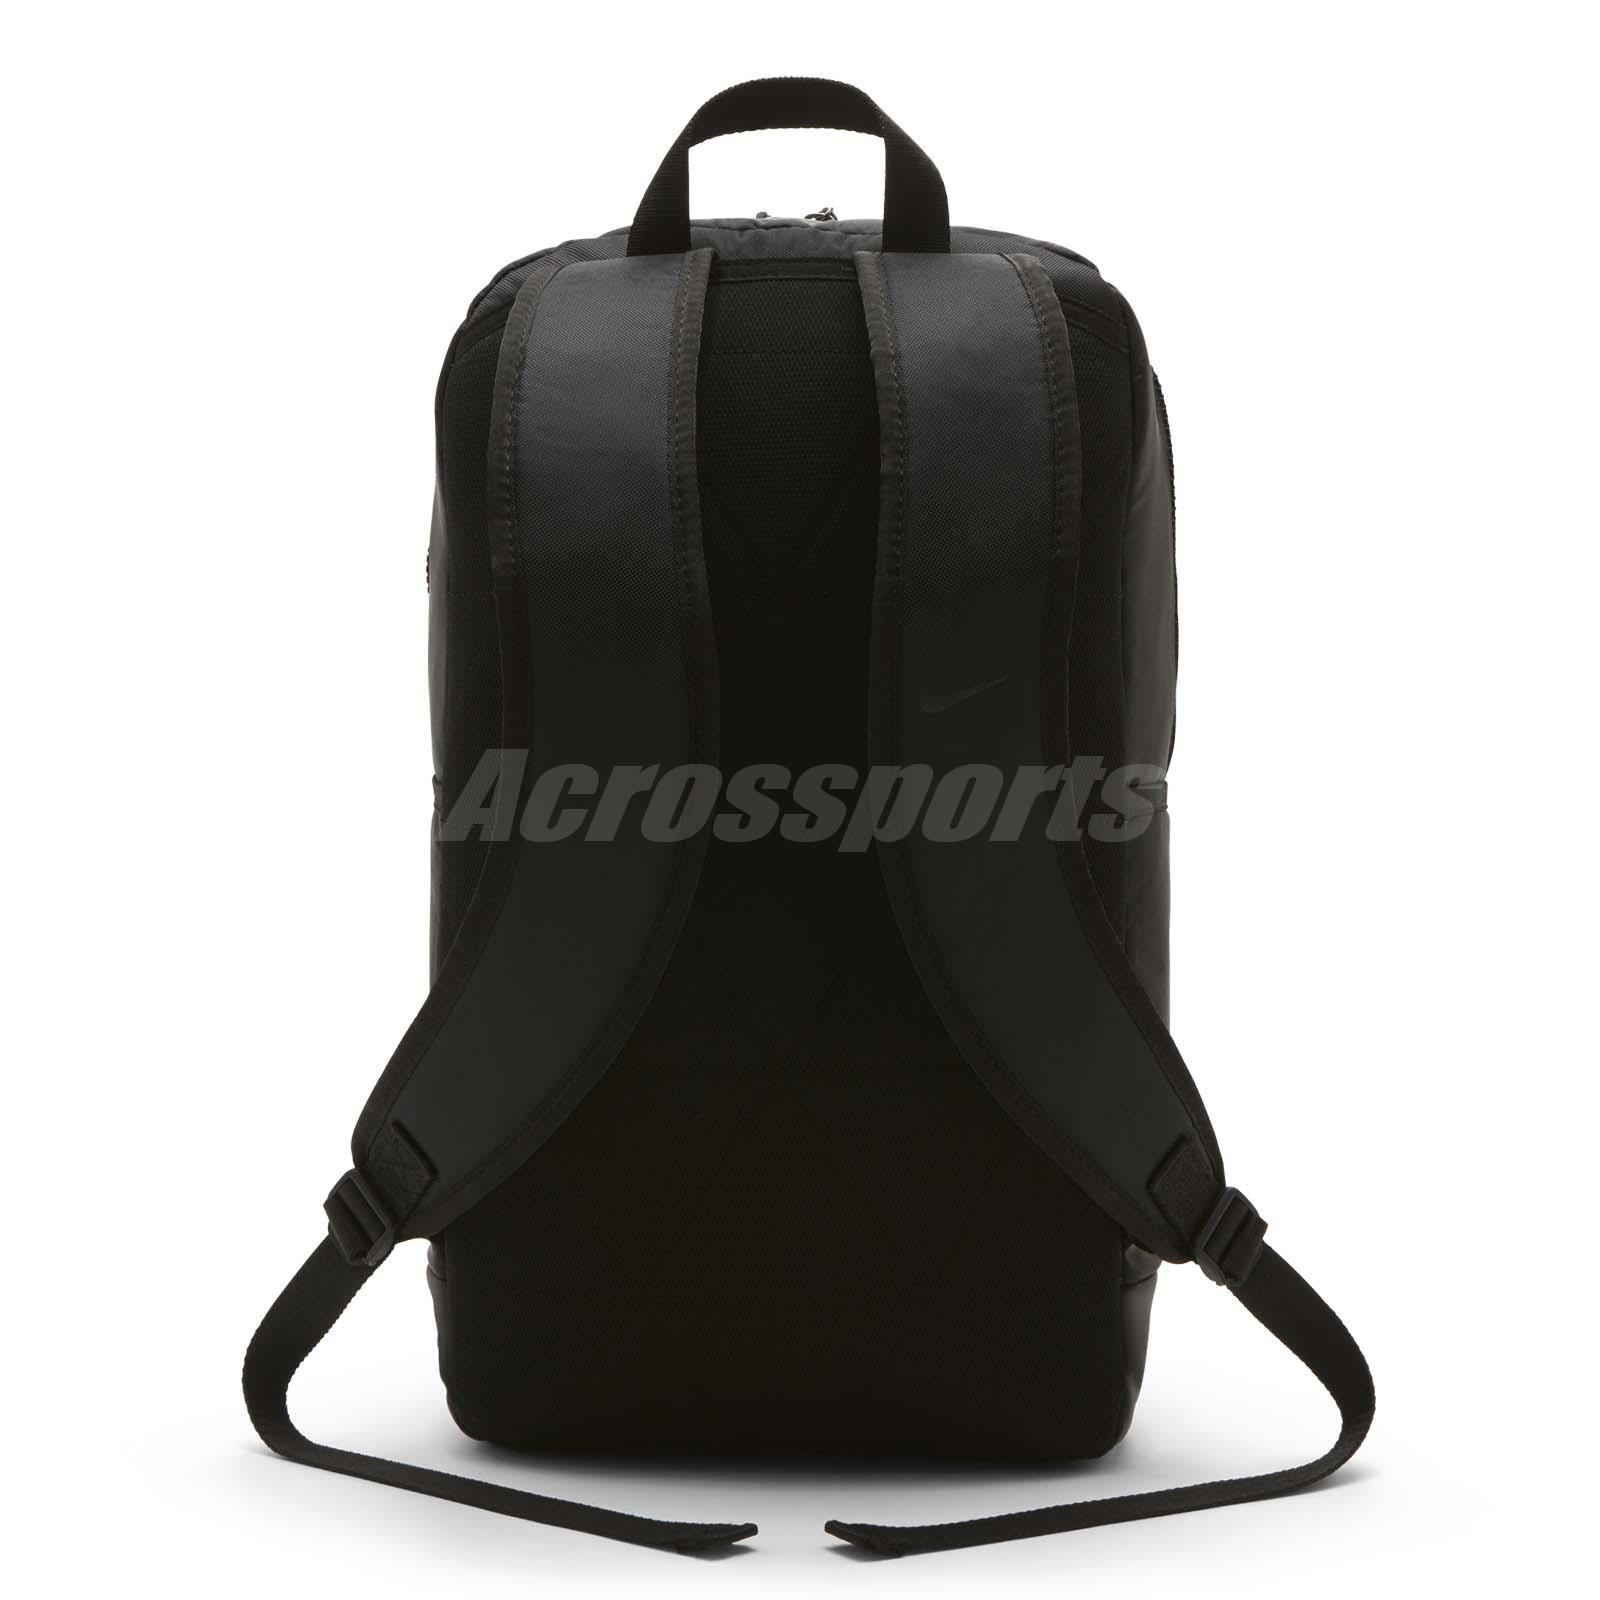 new product 7204d c68b0 Nike Vapor Jet Training Backpack Sport Fitness Workout Gym Bag Black ...